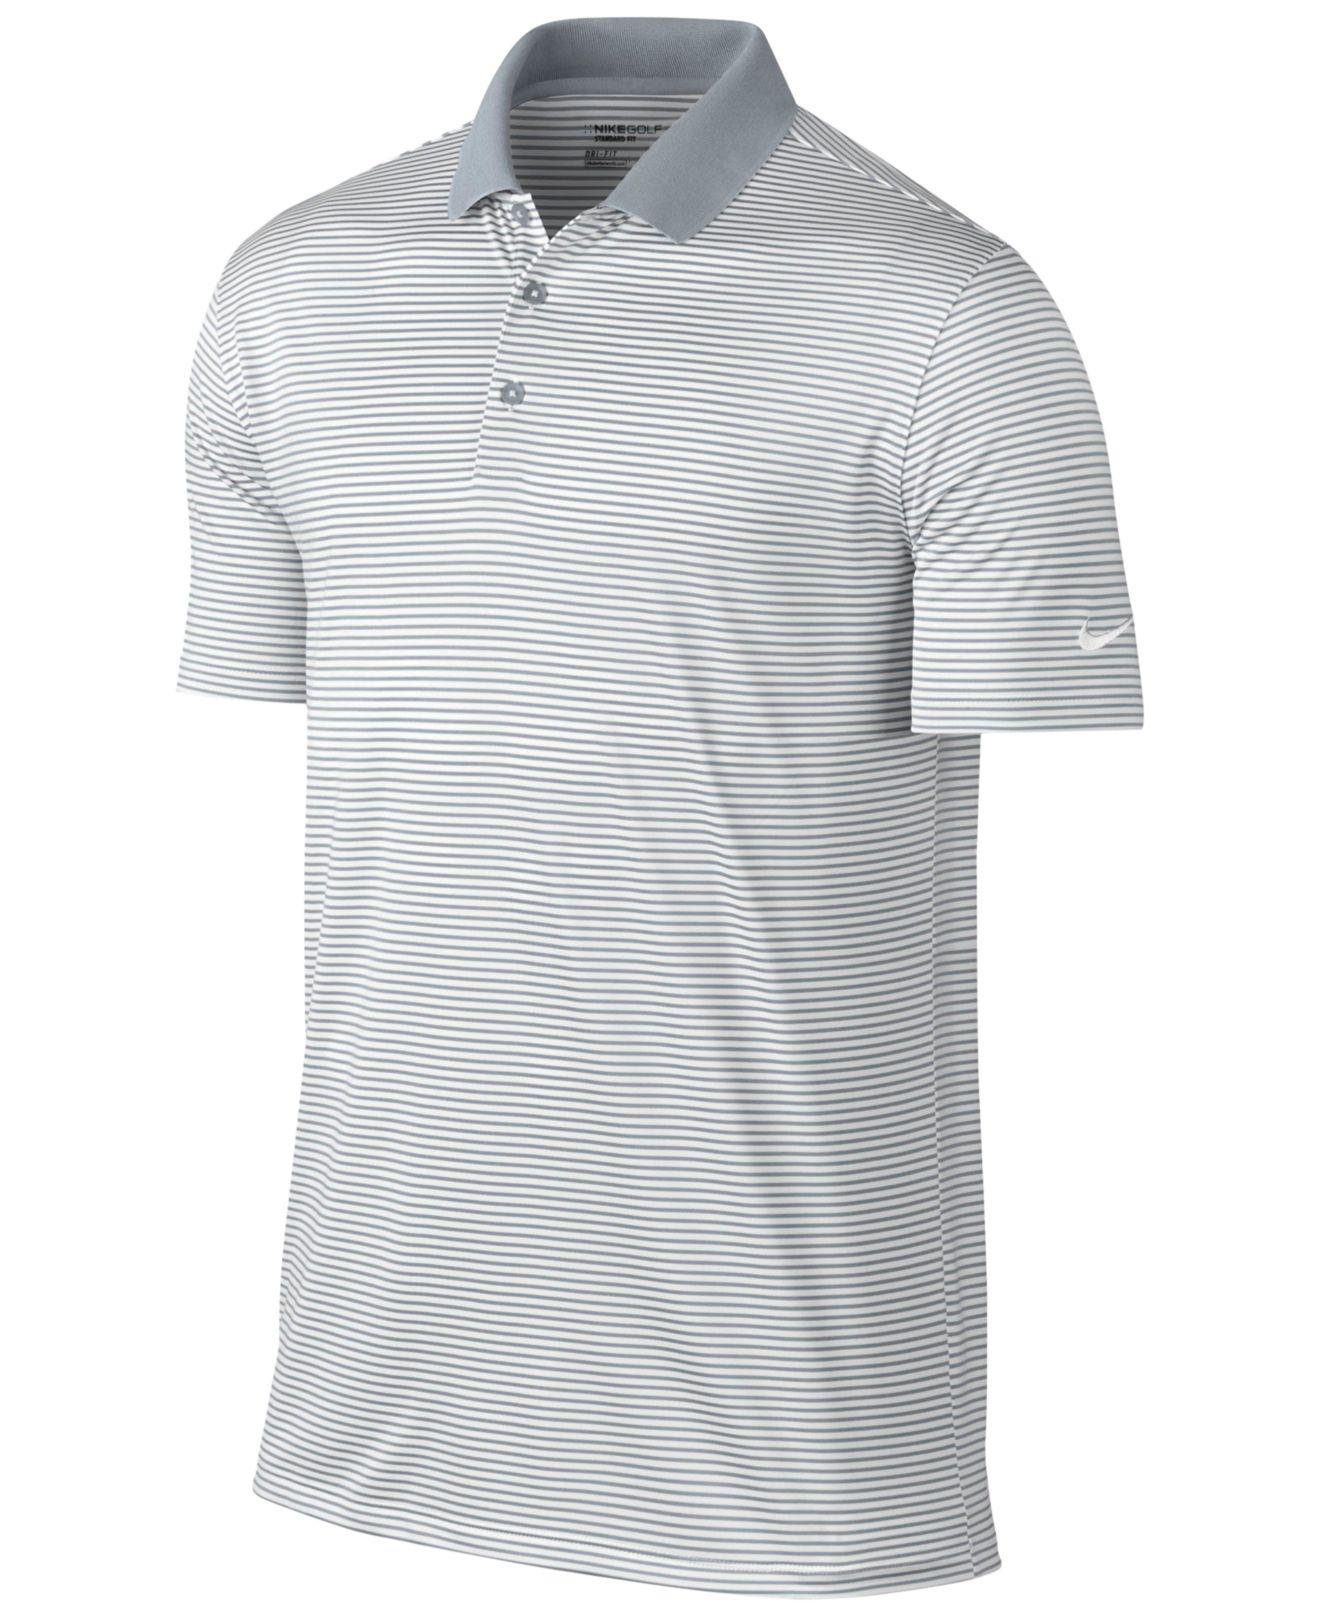 Nike - White Men s Victory Mini Stripe Polo Shirt for Men - Lyst. View  fullscreen ada2c7452